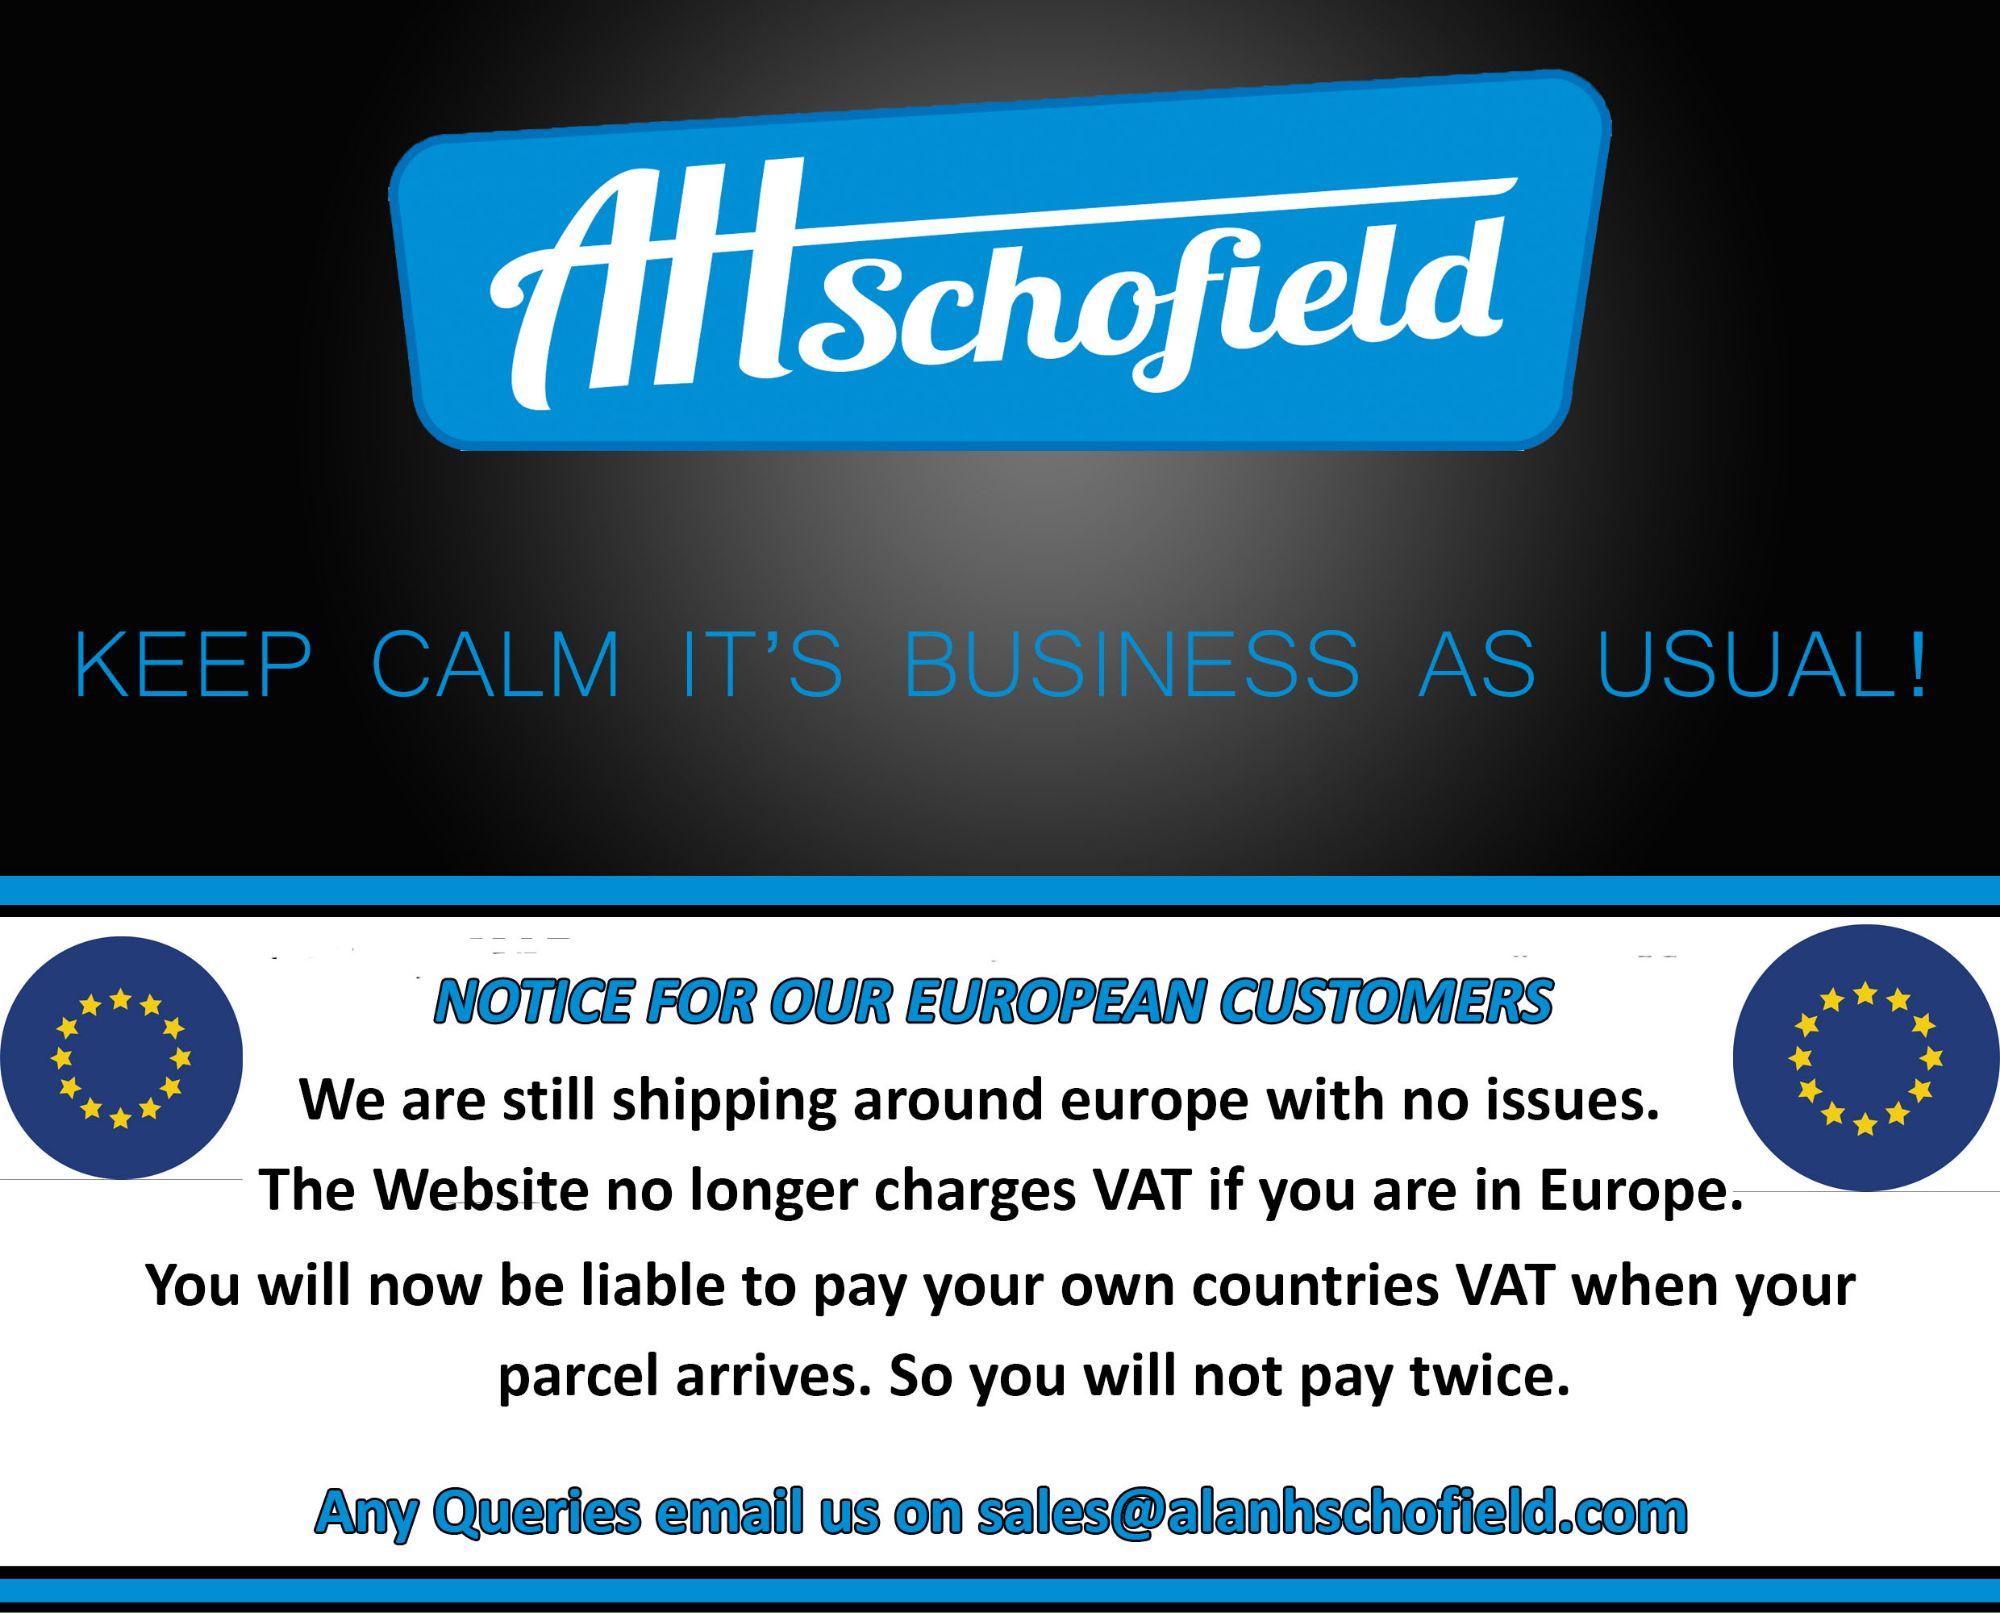 europe notice